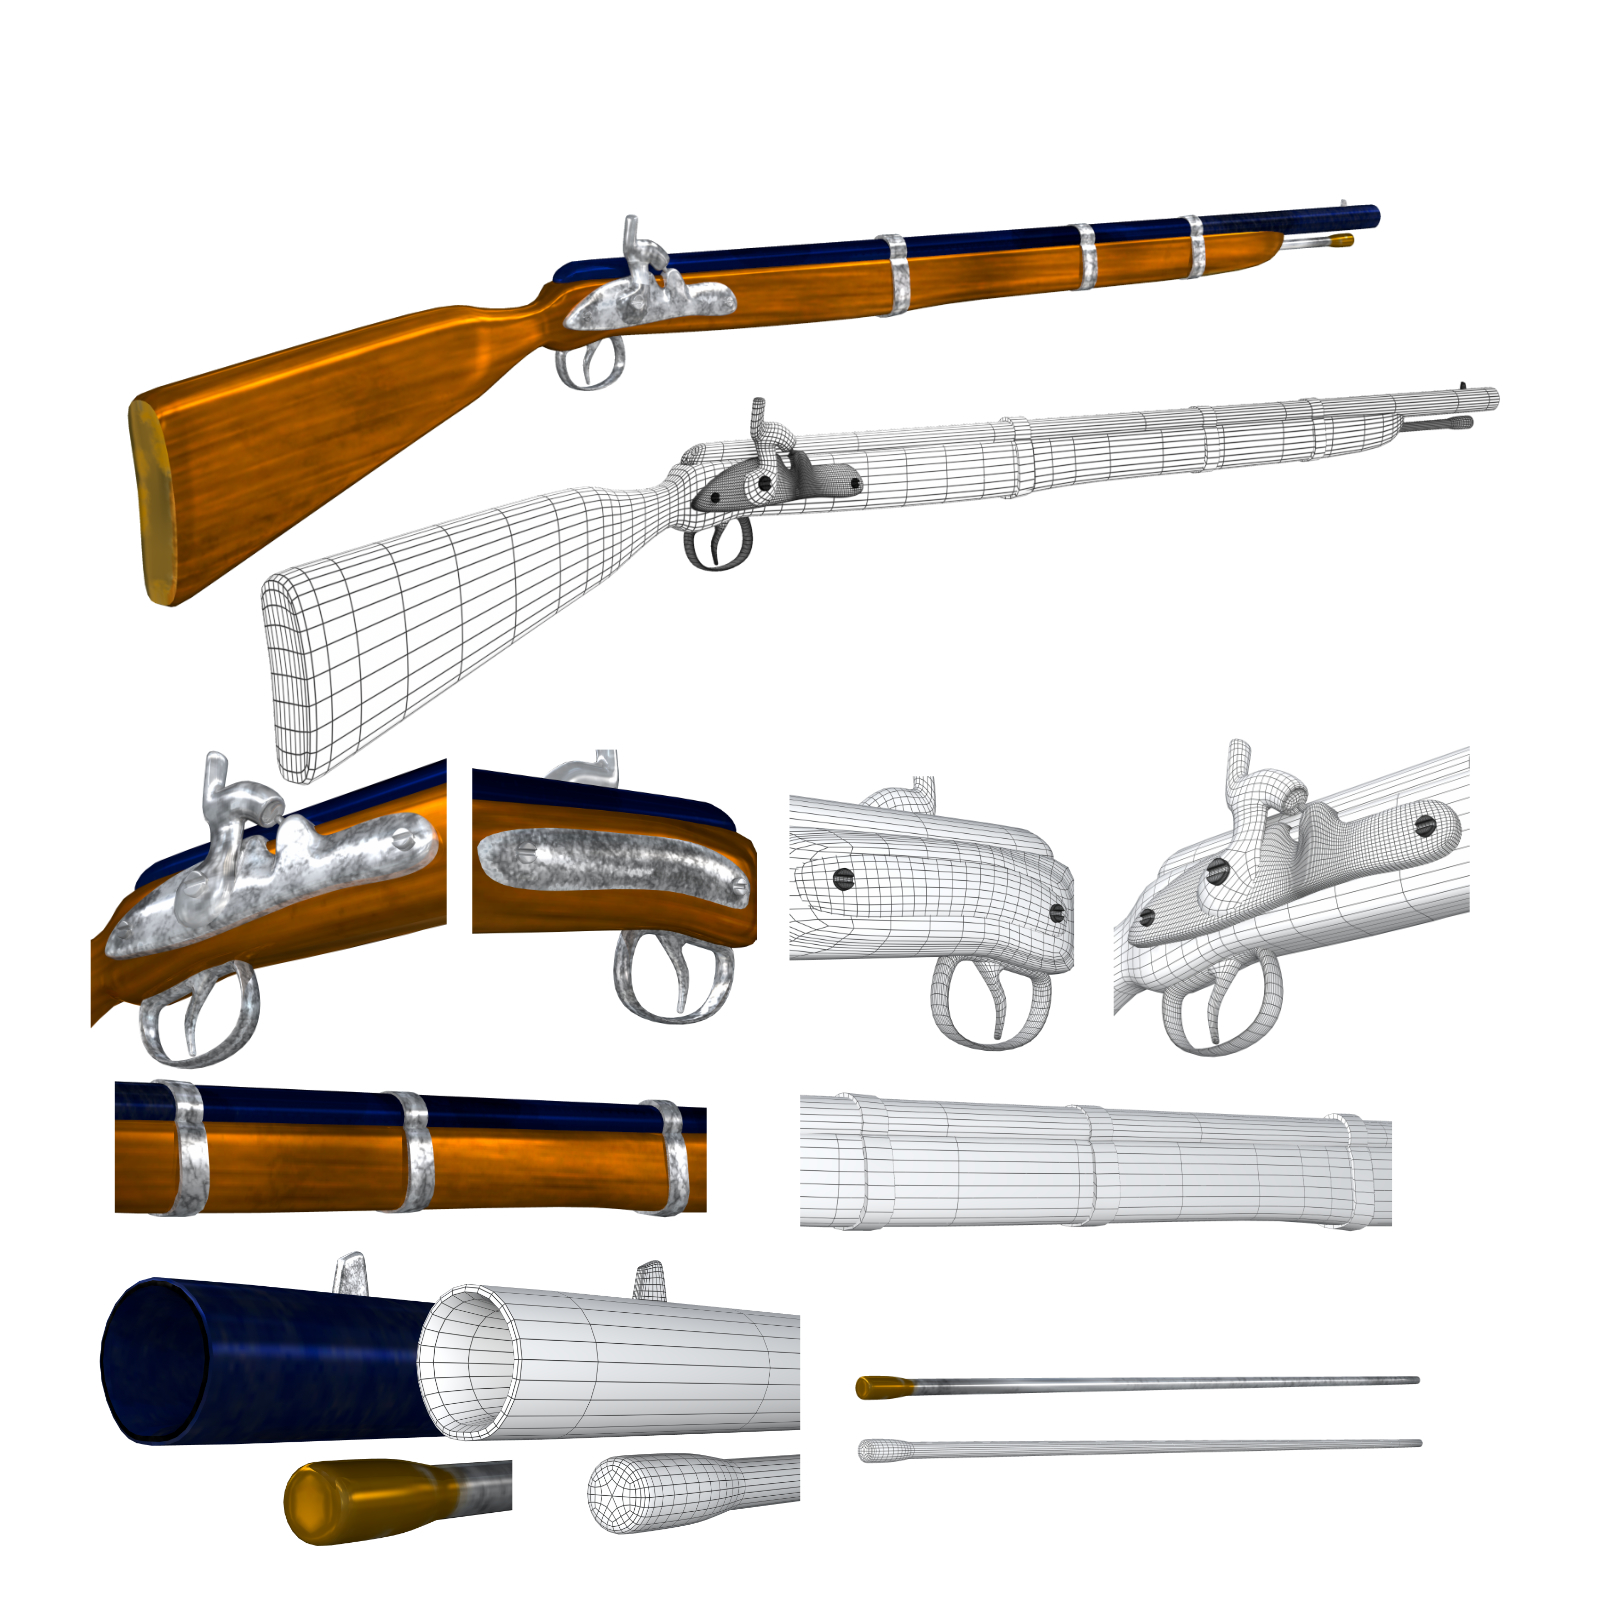 cap-n-ball rifle fbx obj 3d model fbx 220984